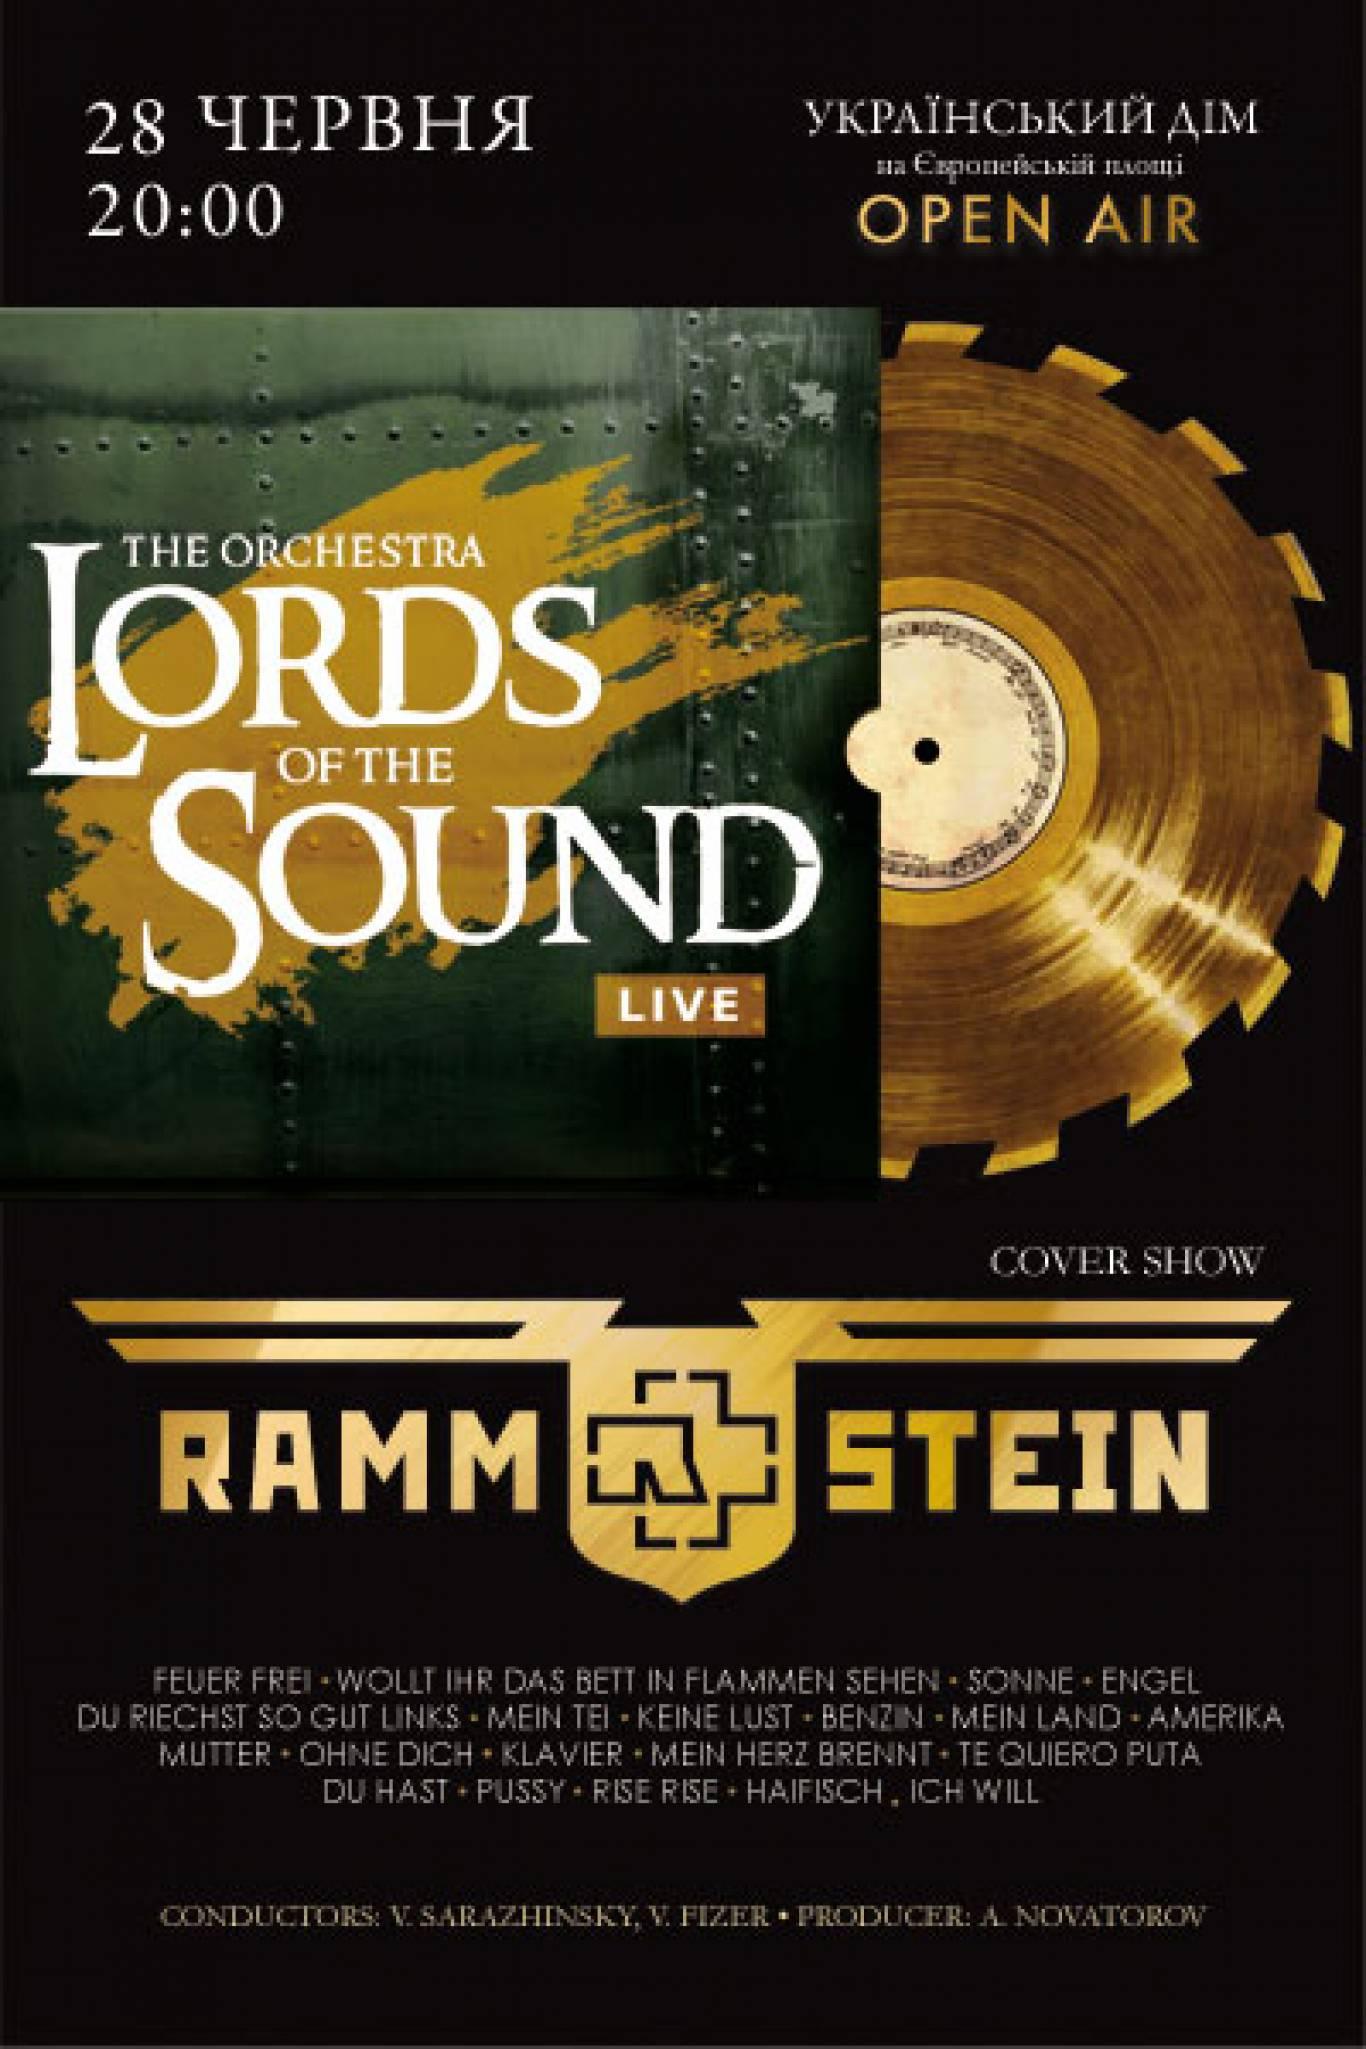 Український Дім: Концерт Lords Оf The Sound Rammstein cover